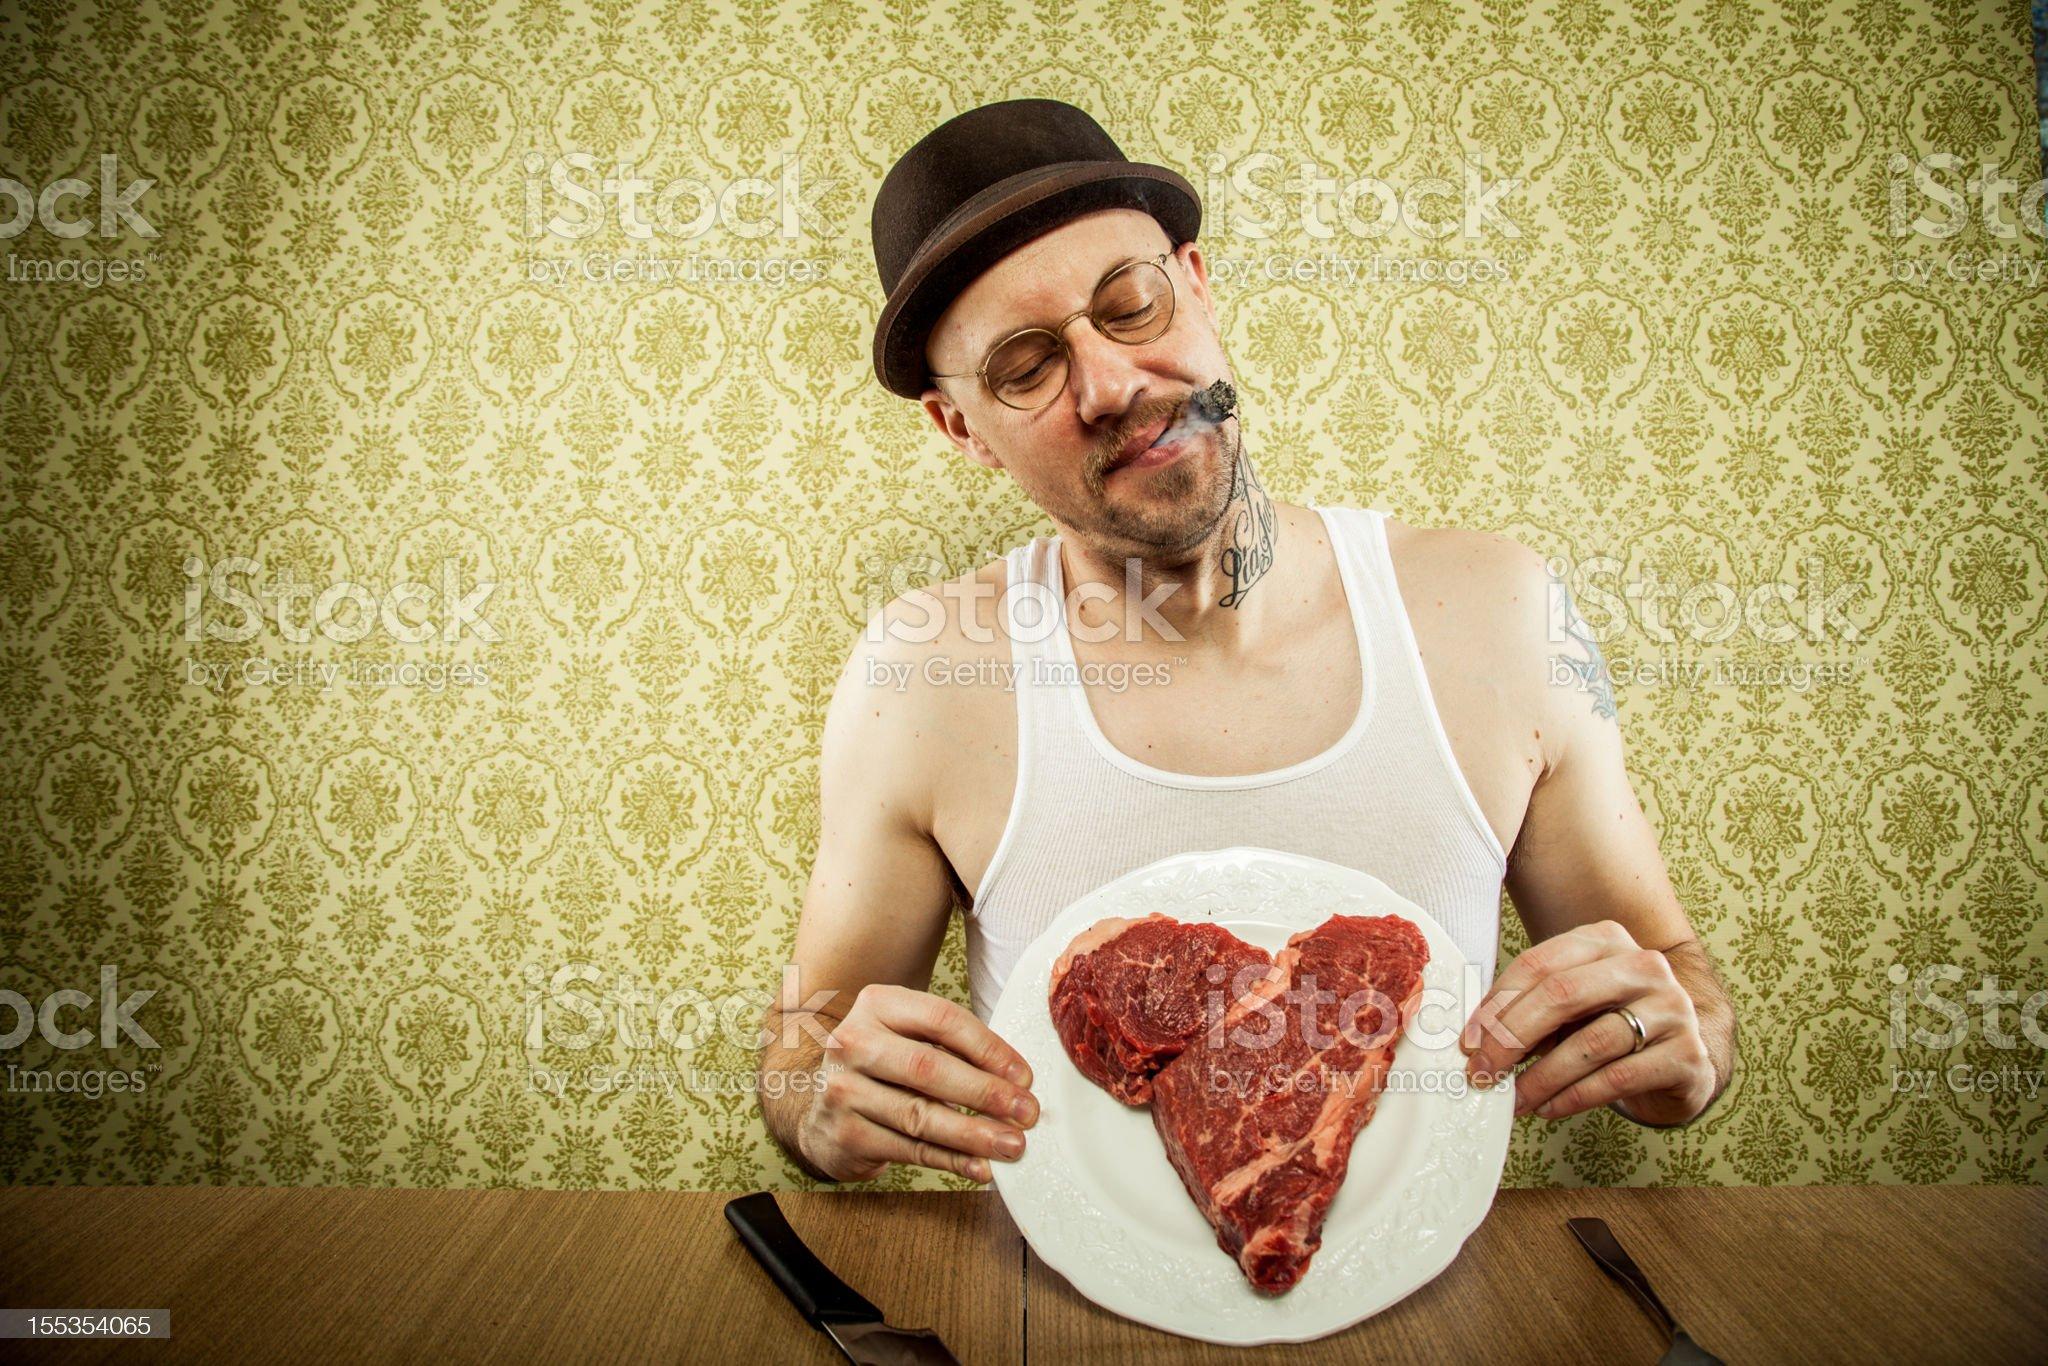 Cigar Smoking Man Holding a Heart Shaped Steak royalty-free stock photo